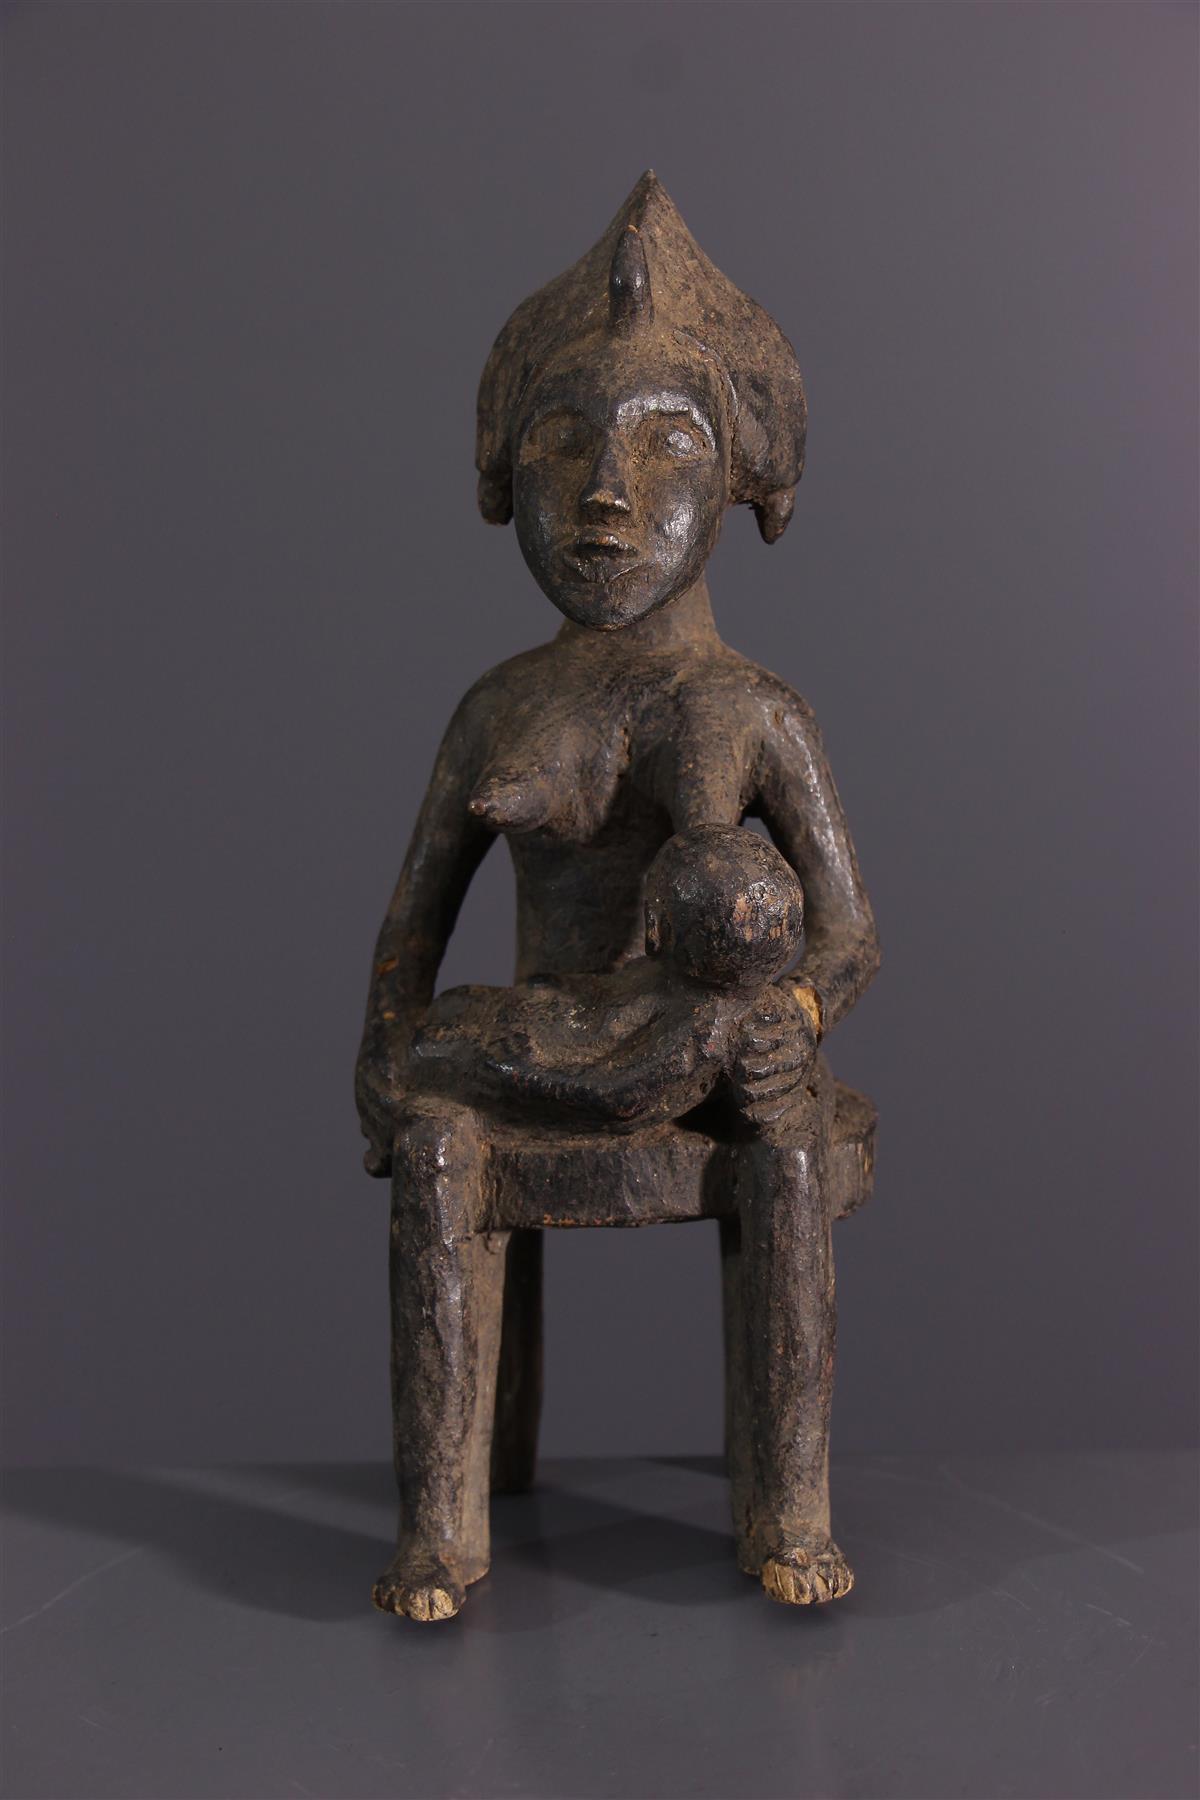 Senufo statuette - African art